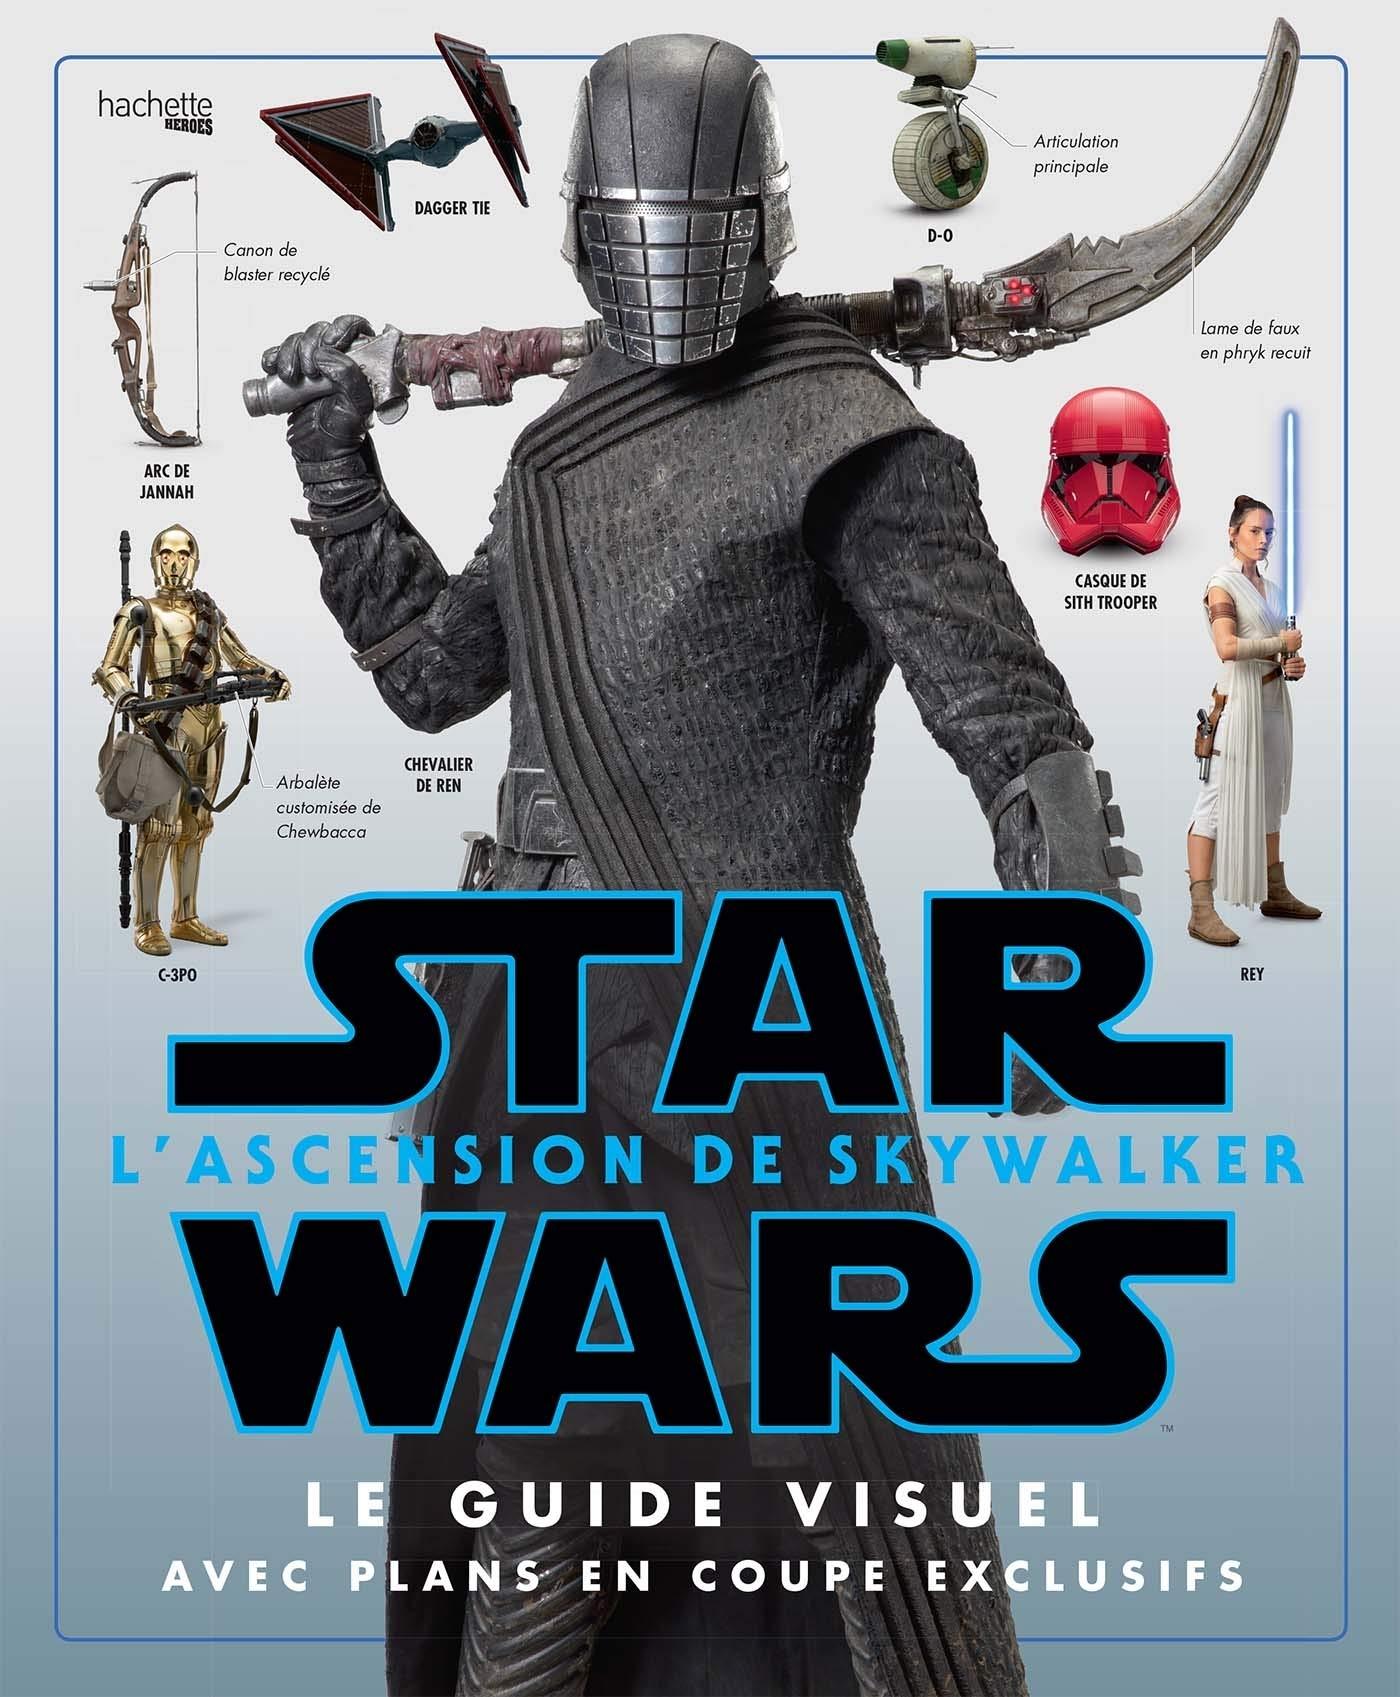 Star Wars : L'Ascension de Skywalker : Le Guide Visuel